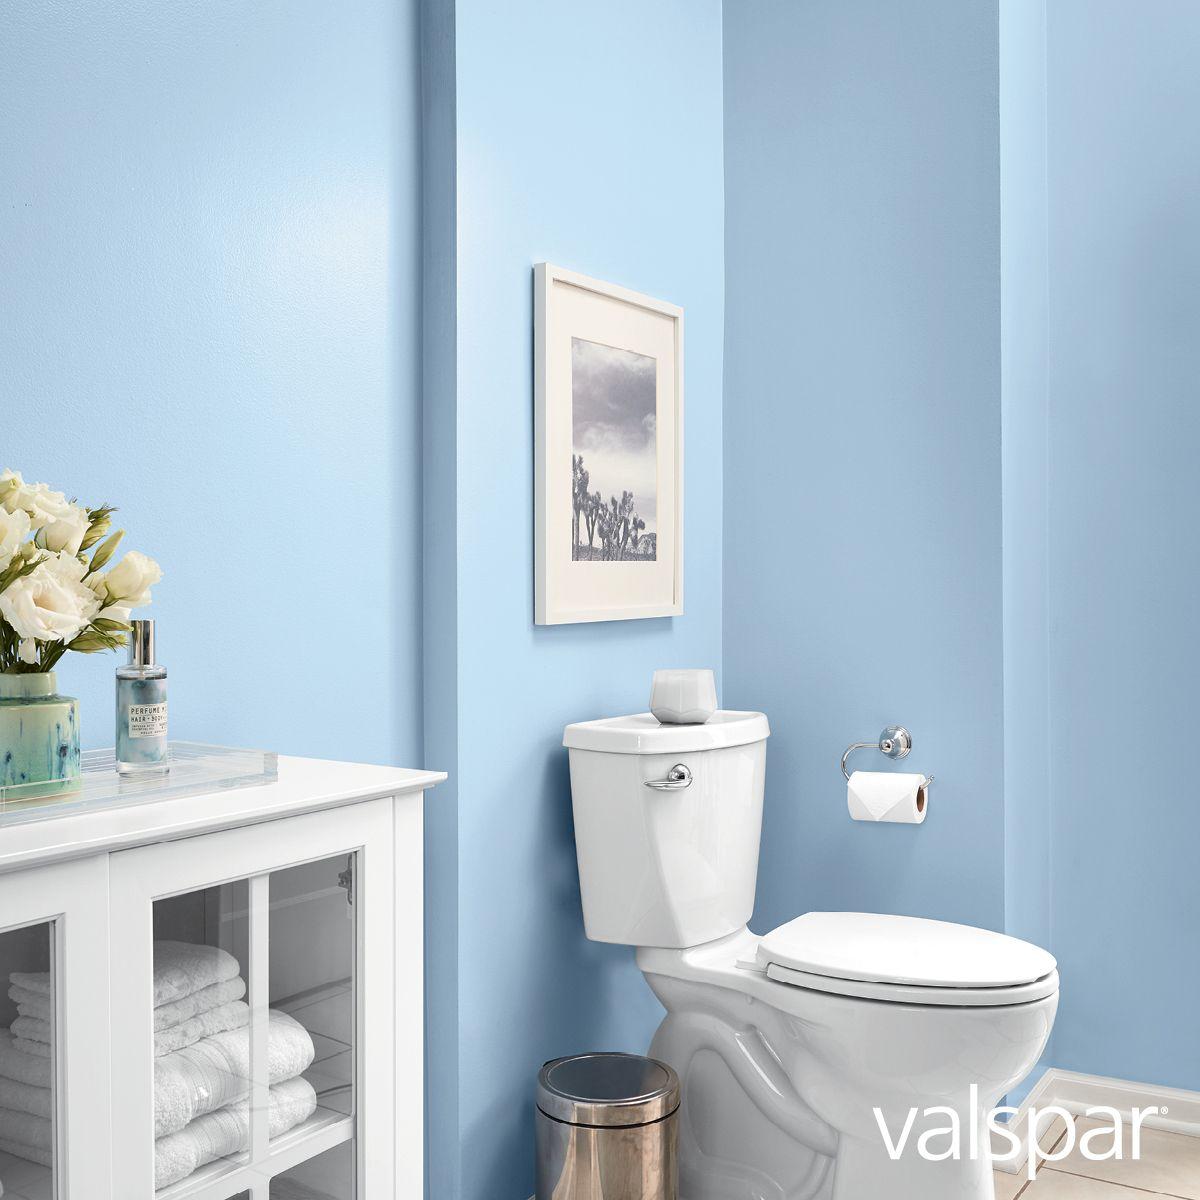 A Beautiful Restorative Blue Paint Color Can Turn Your Private Bathroom Into A Personal Spa Add Luxuriou Valspar Colors Trending Paint Colors Bathroom Colors